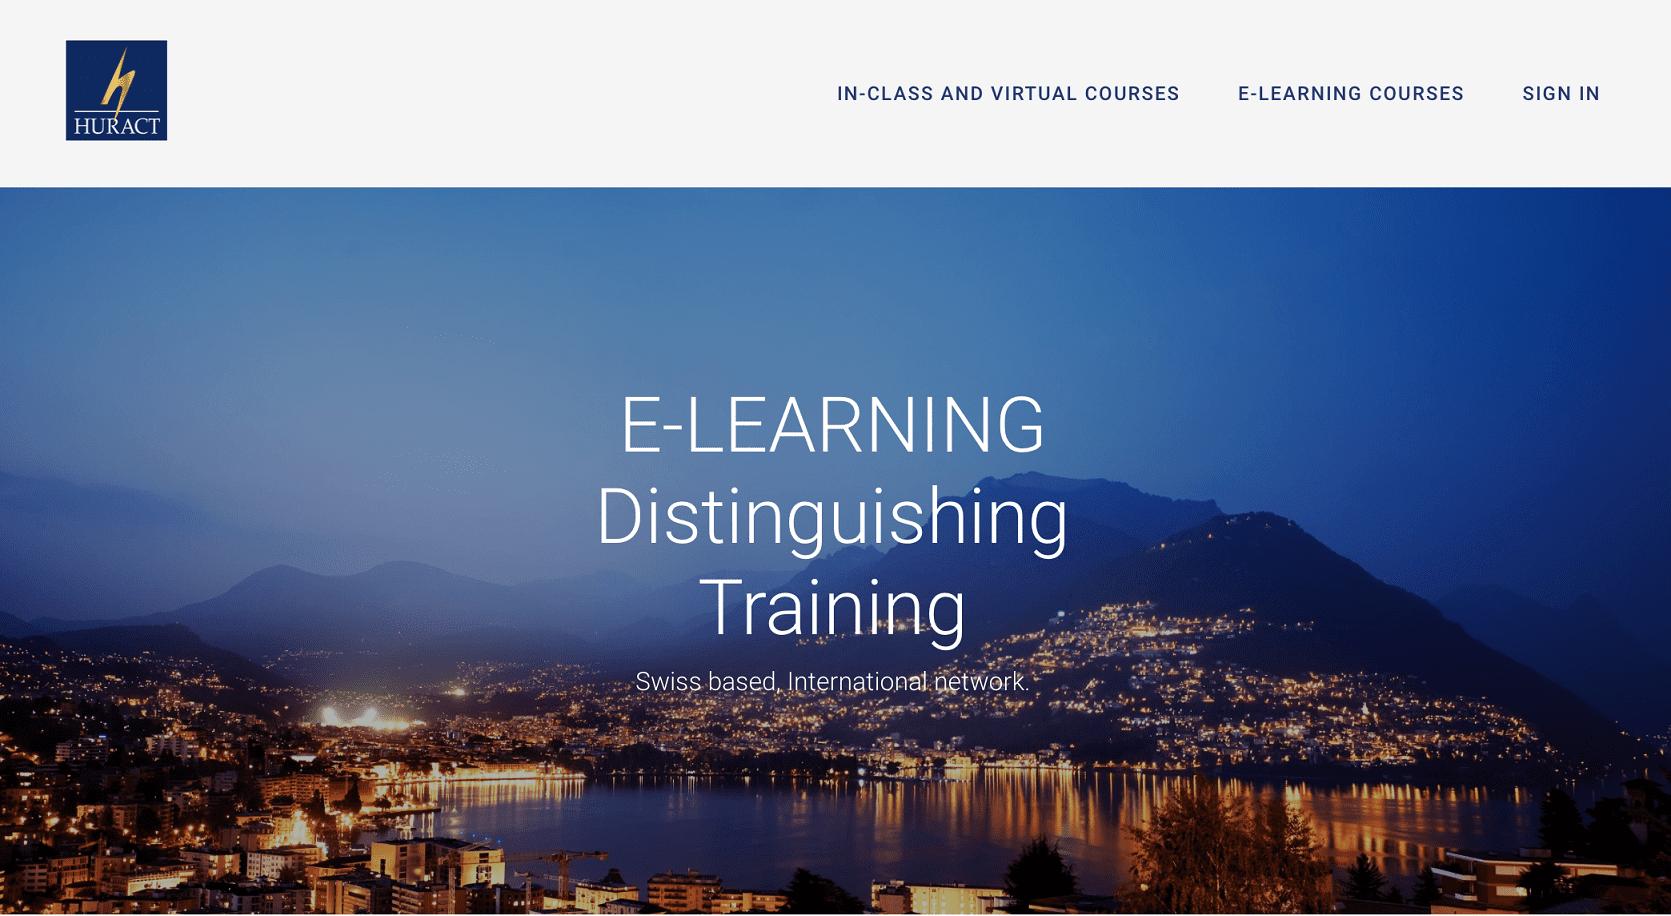 HURACT Distinguishing Training